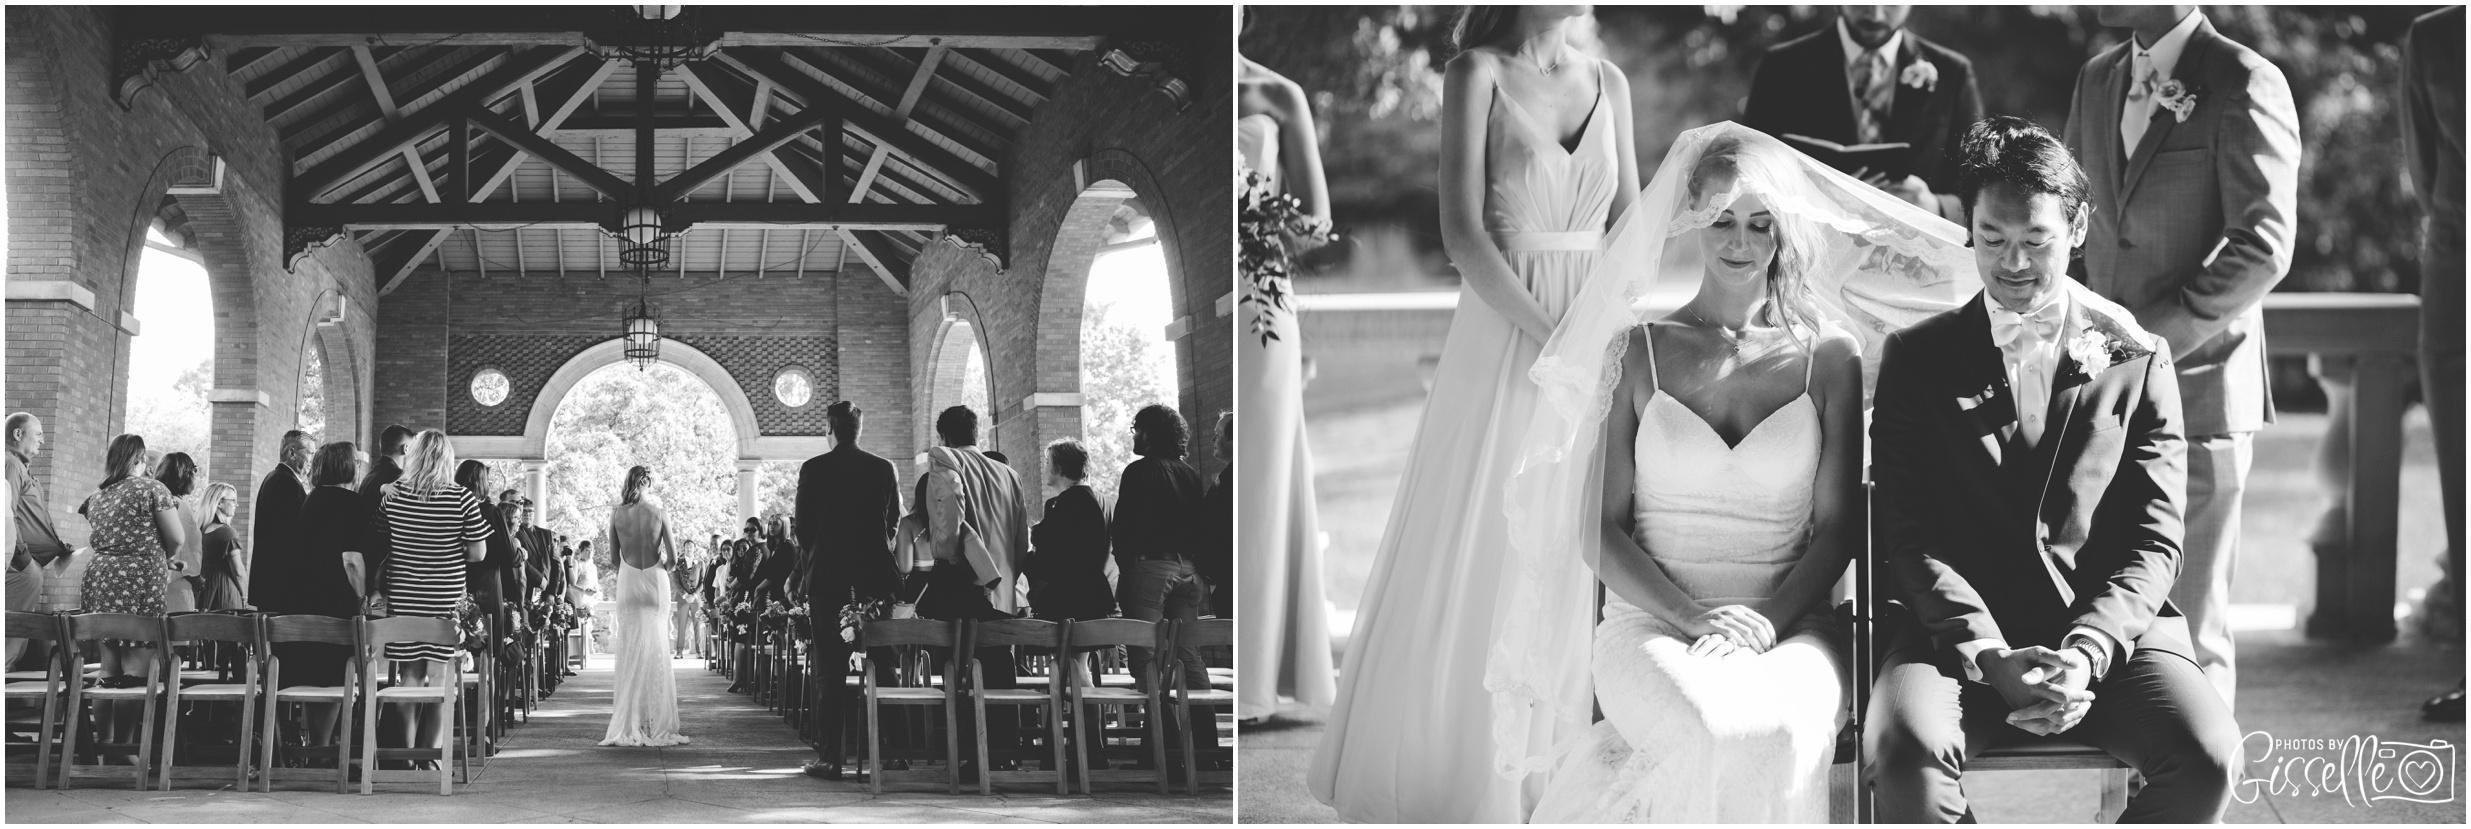 Columbus Park Refectory Wedding_0012.jpg